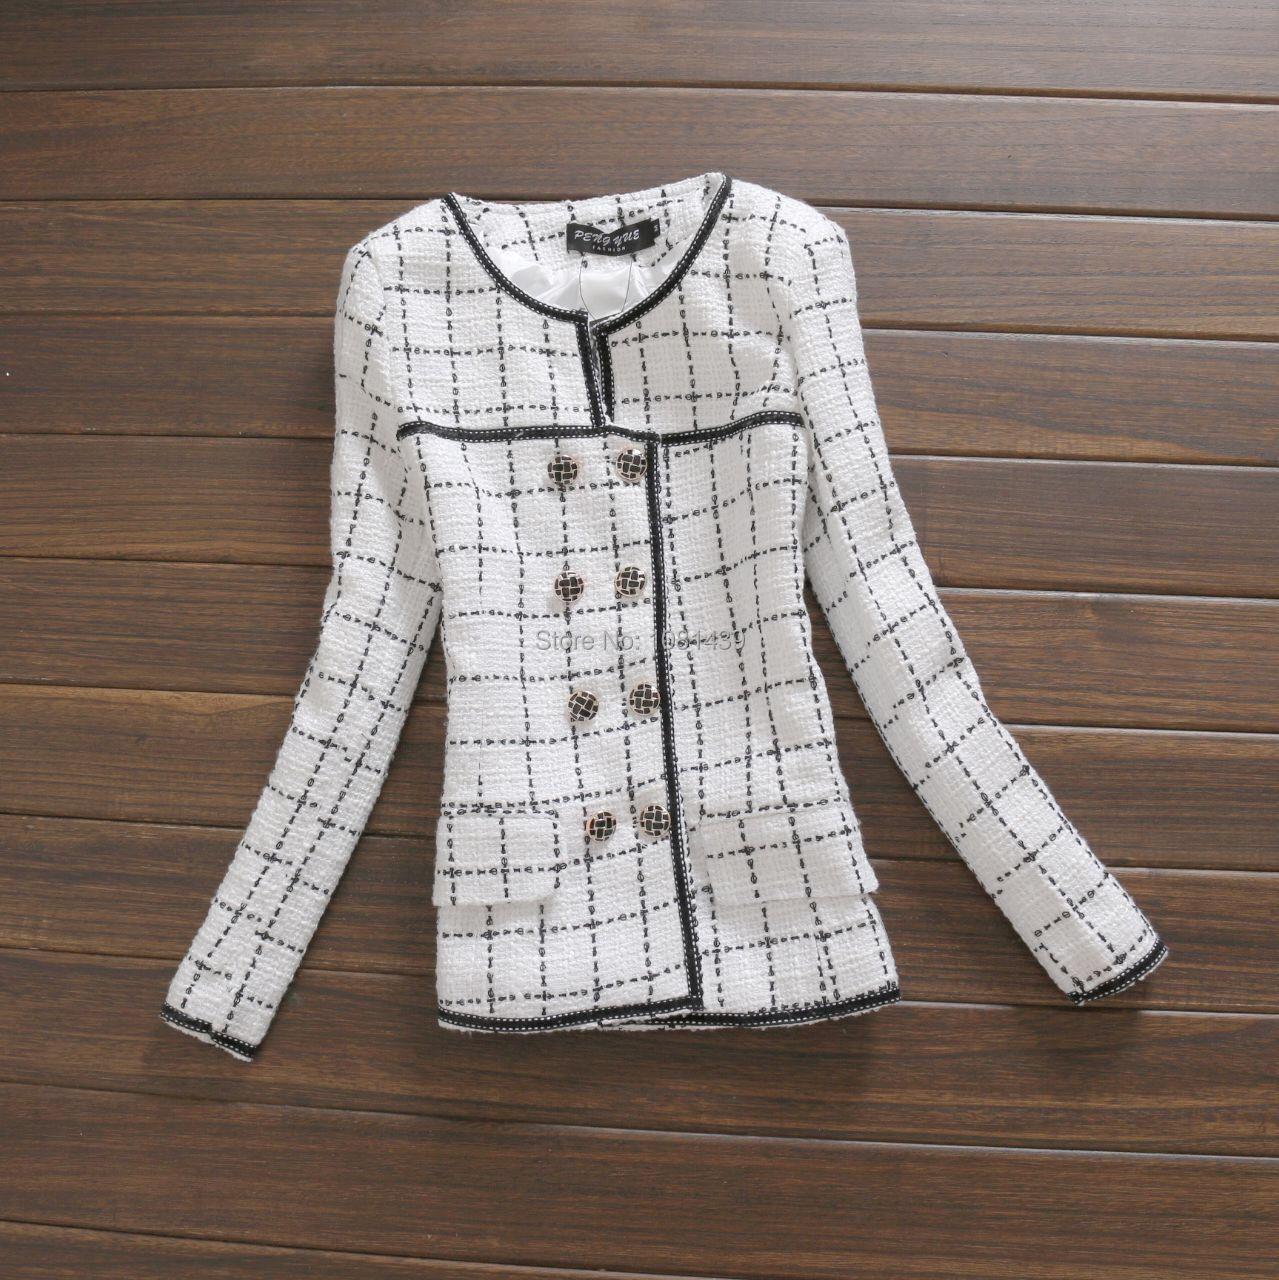 Женская одежда из шерсти Women Outfit Work Wear Casacos Femininos XXL Korean Style Female Casaco женская одежда из шерсти xxl y520